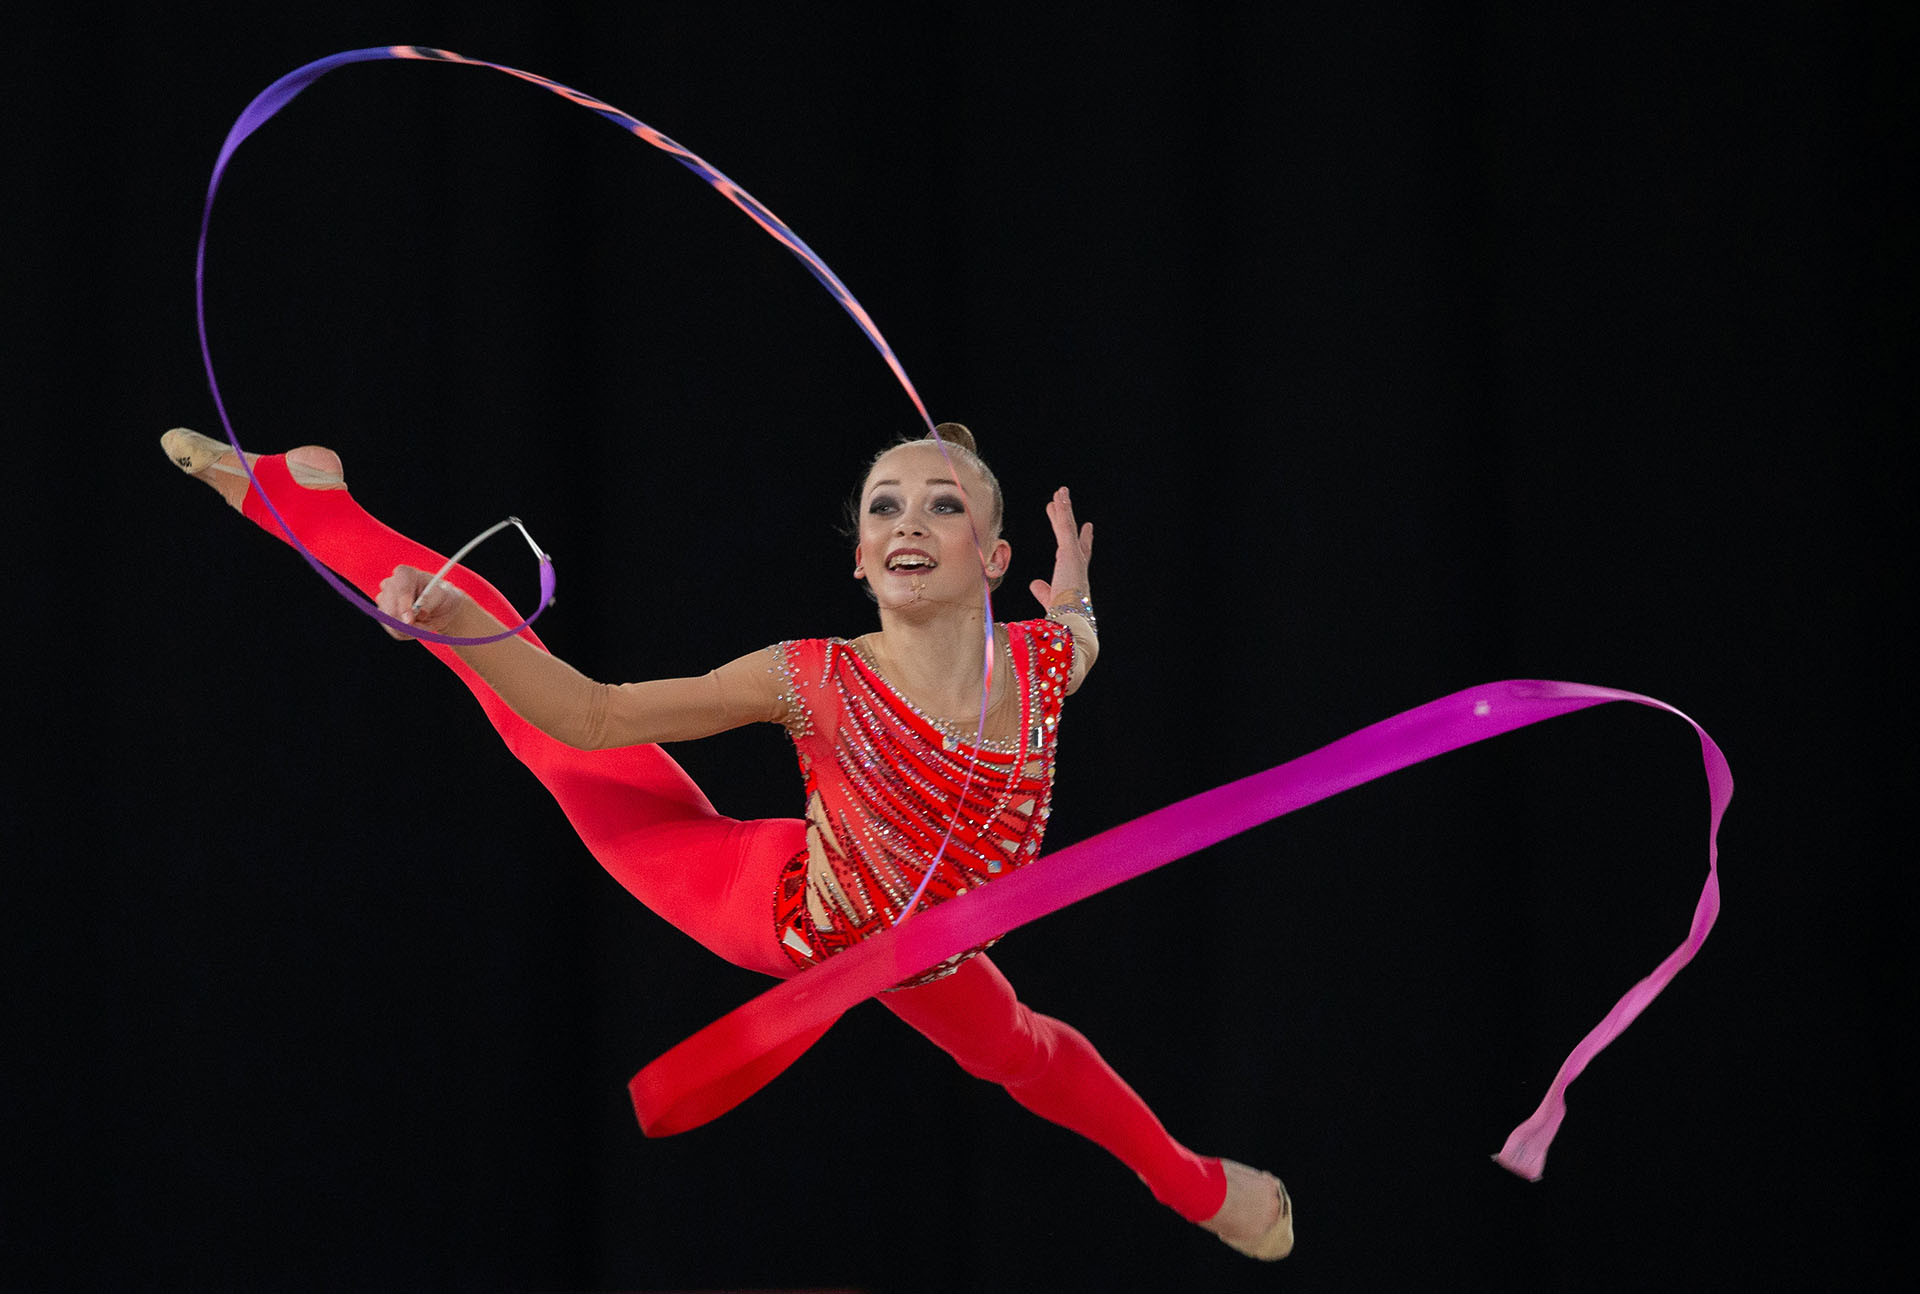 Khrystyna Pohranychna y su impactante rutina de gimnasia rítmica (Foto: Ivo Gonzalez para OIS/IOC/Handout)